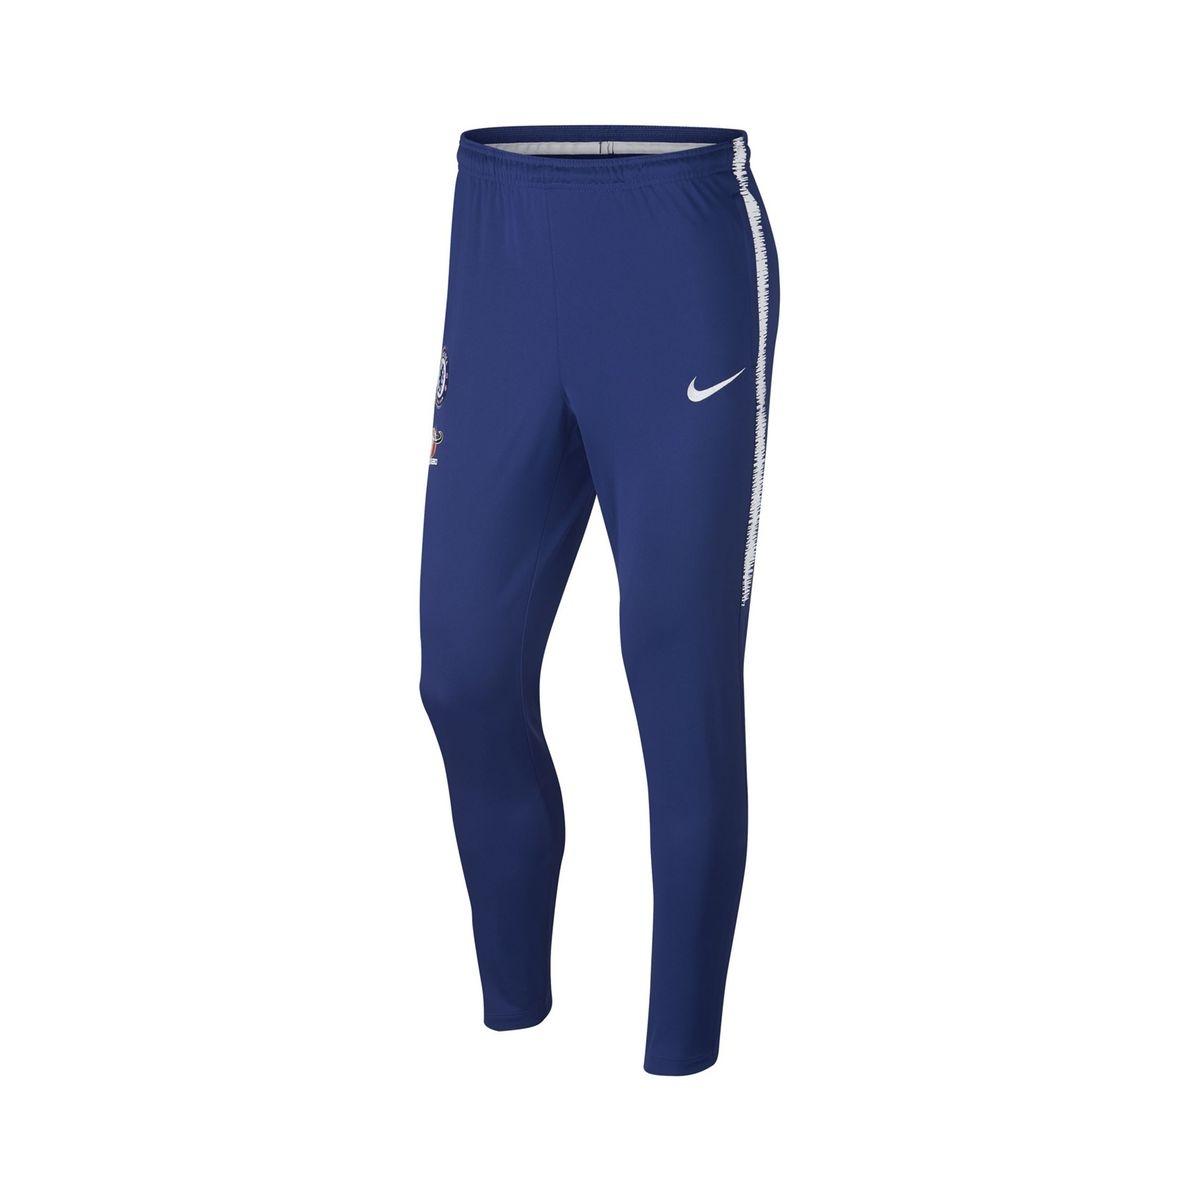 Pantalon Entraînement Nike Chelsea Squad KPZ Bleu